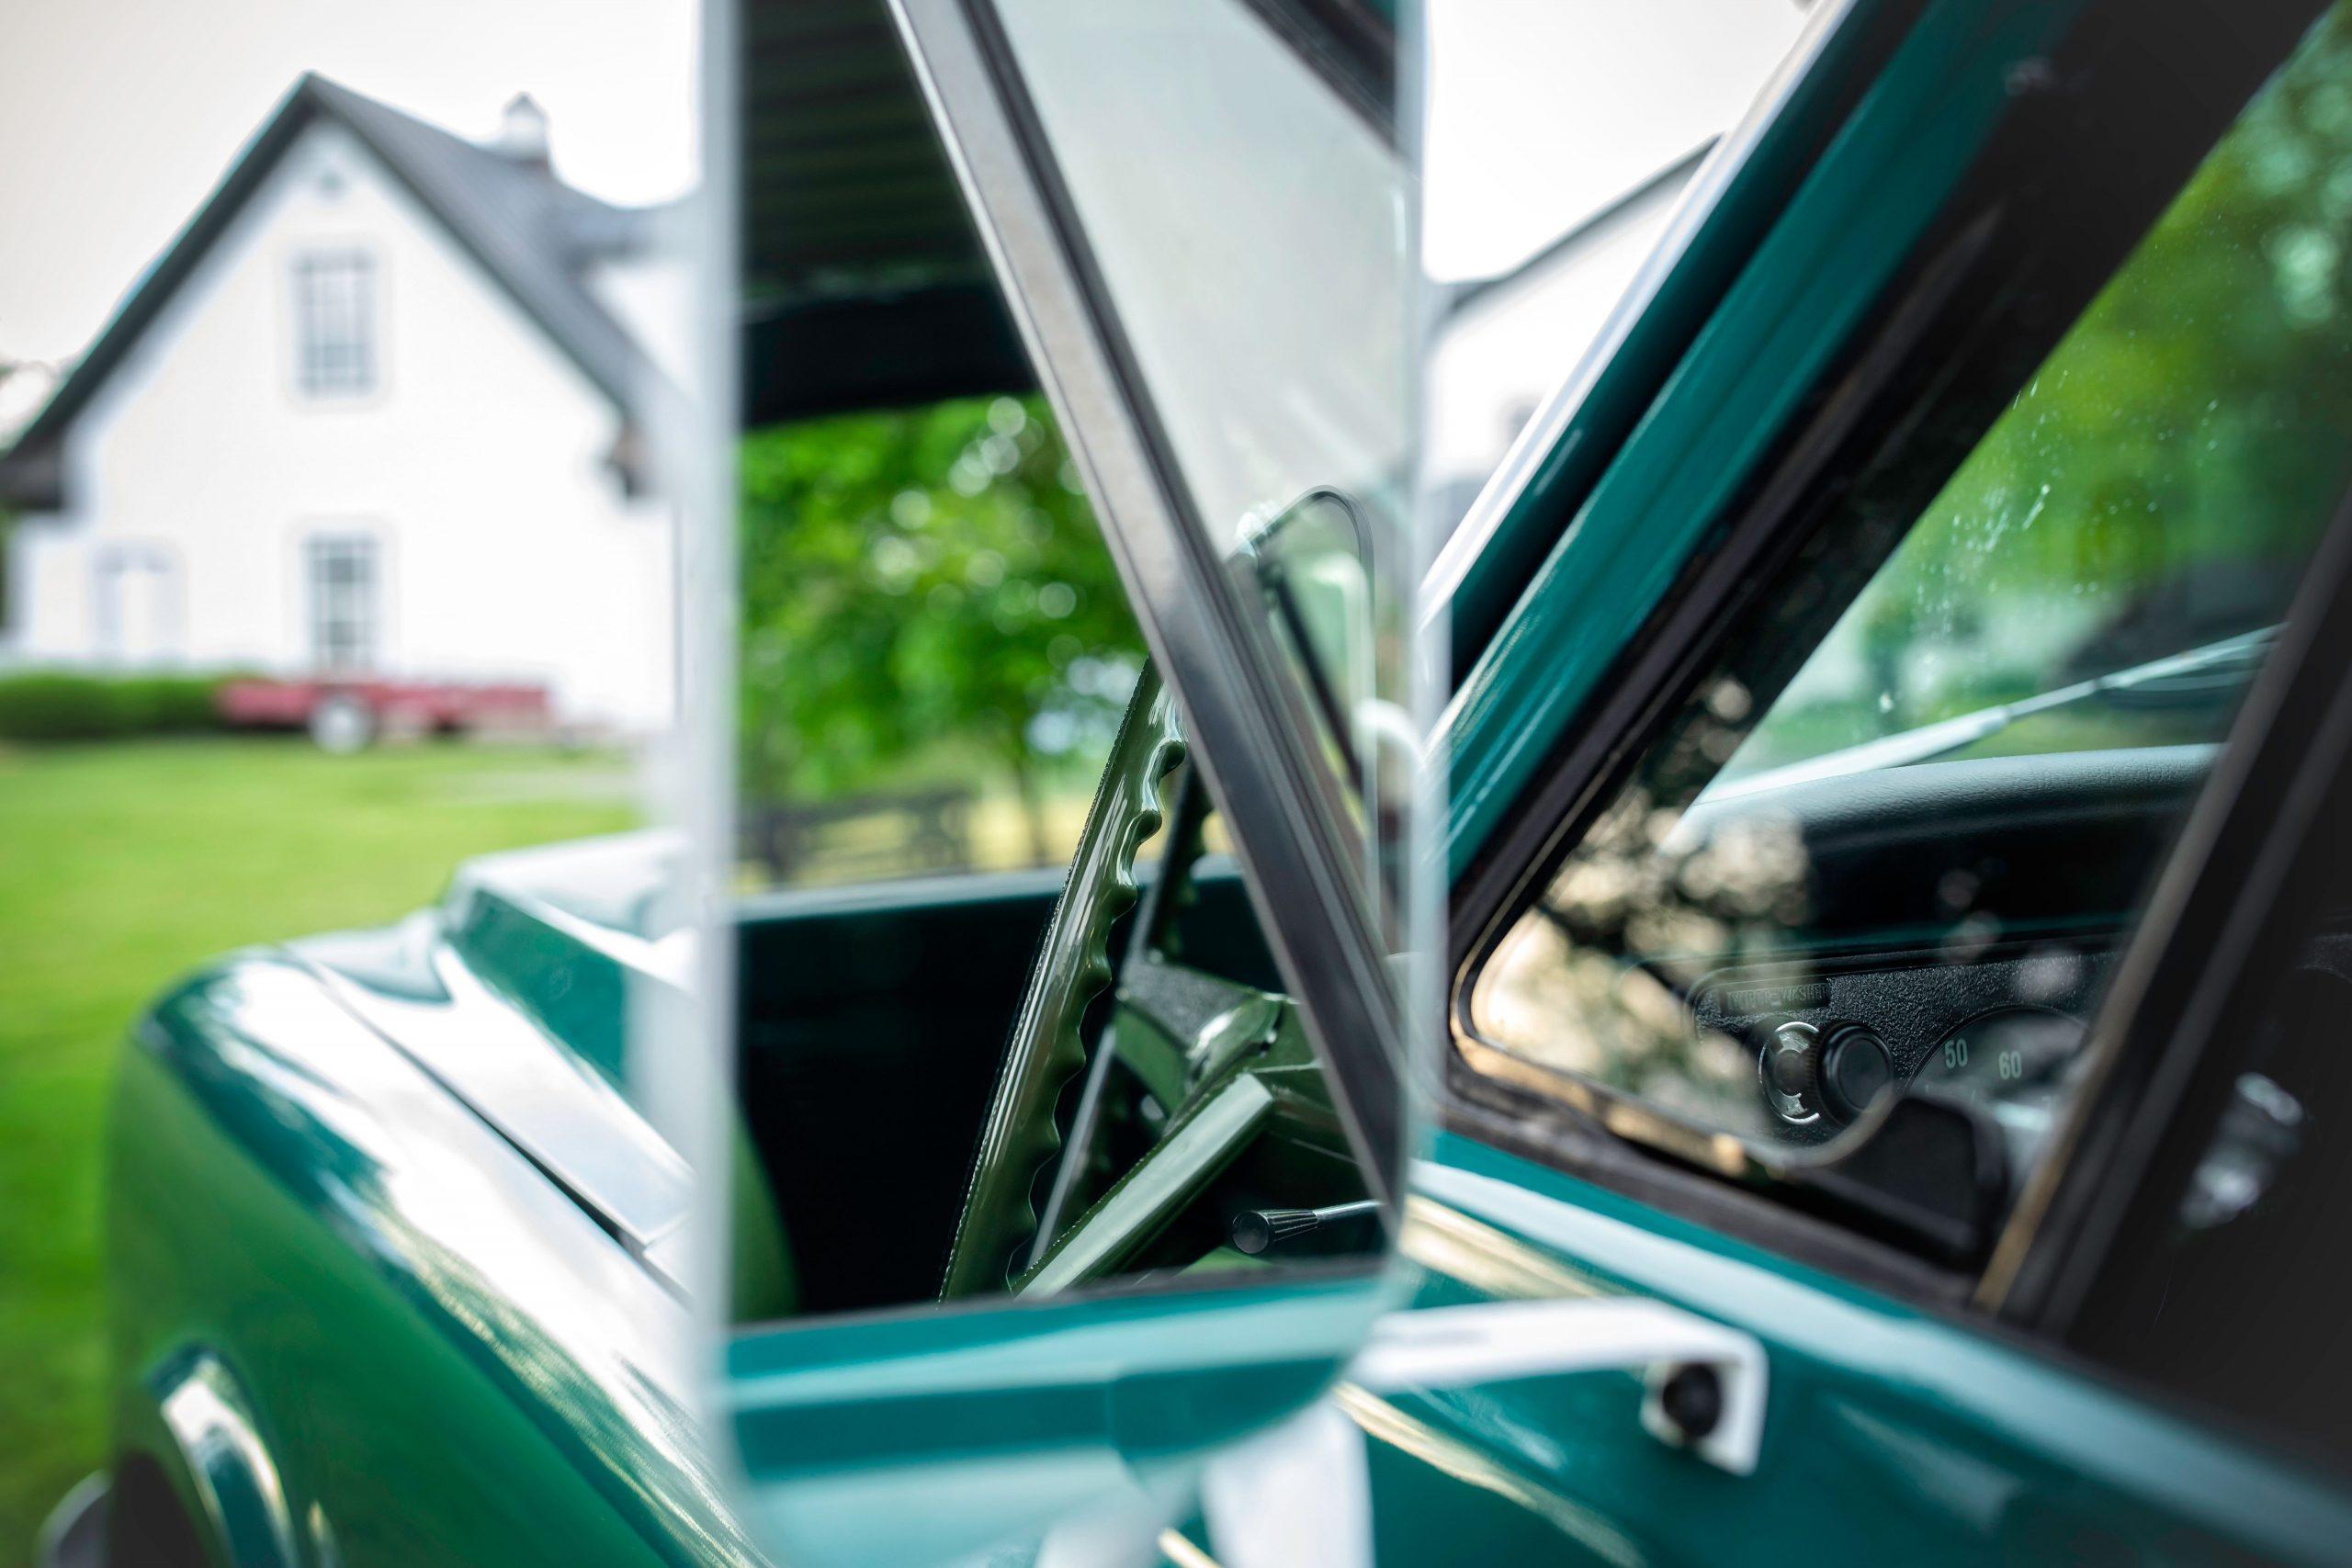 Elvis Presley Owned 1967 GMC Pickup side mirror reflection